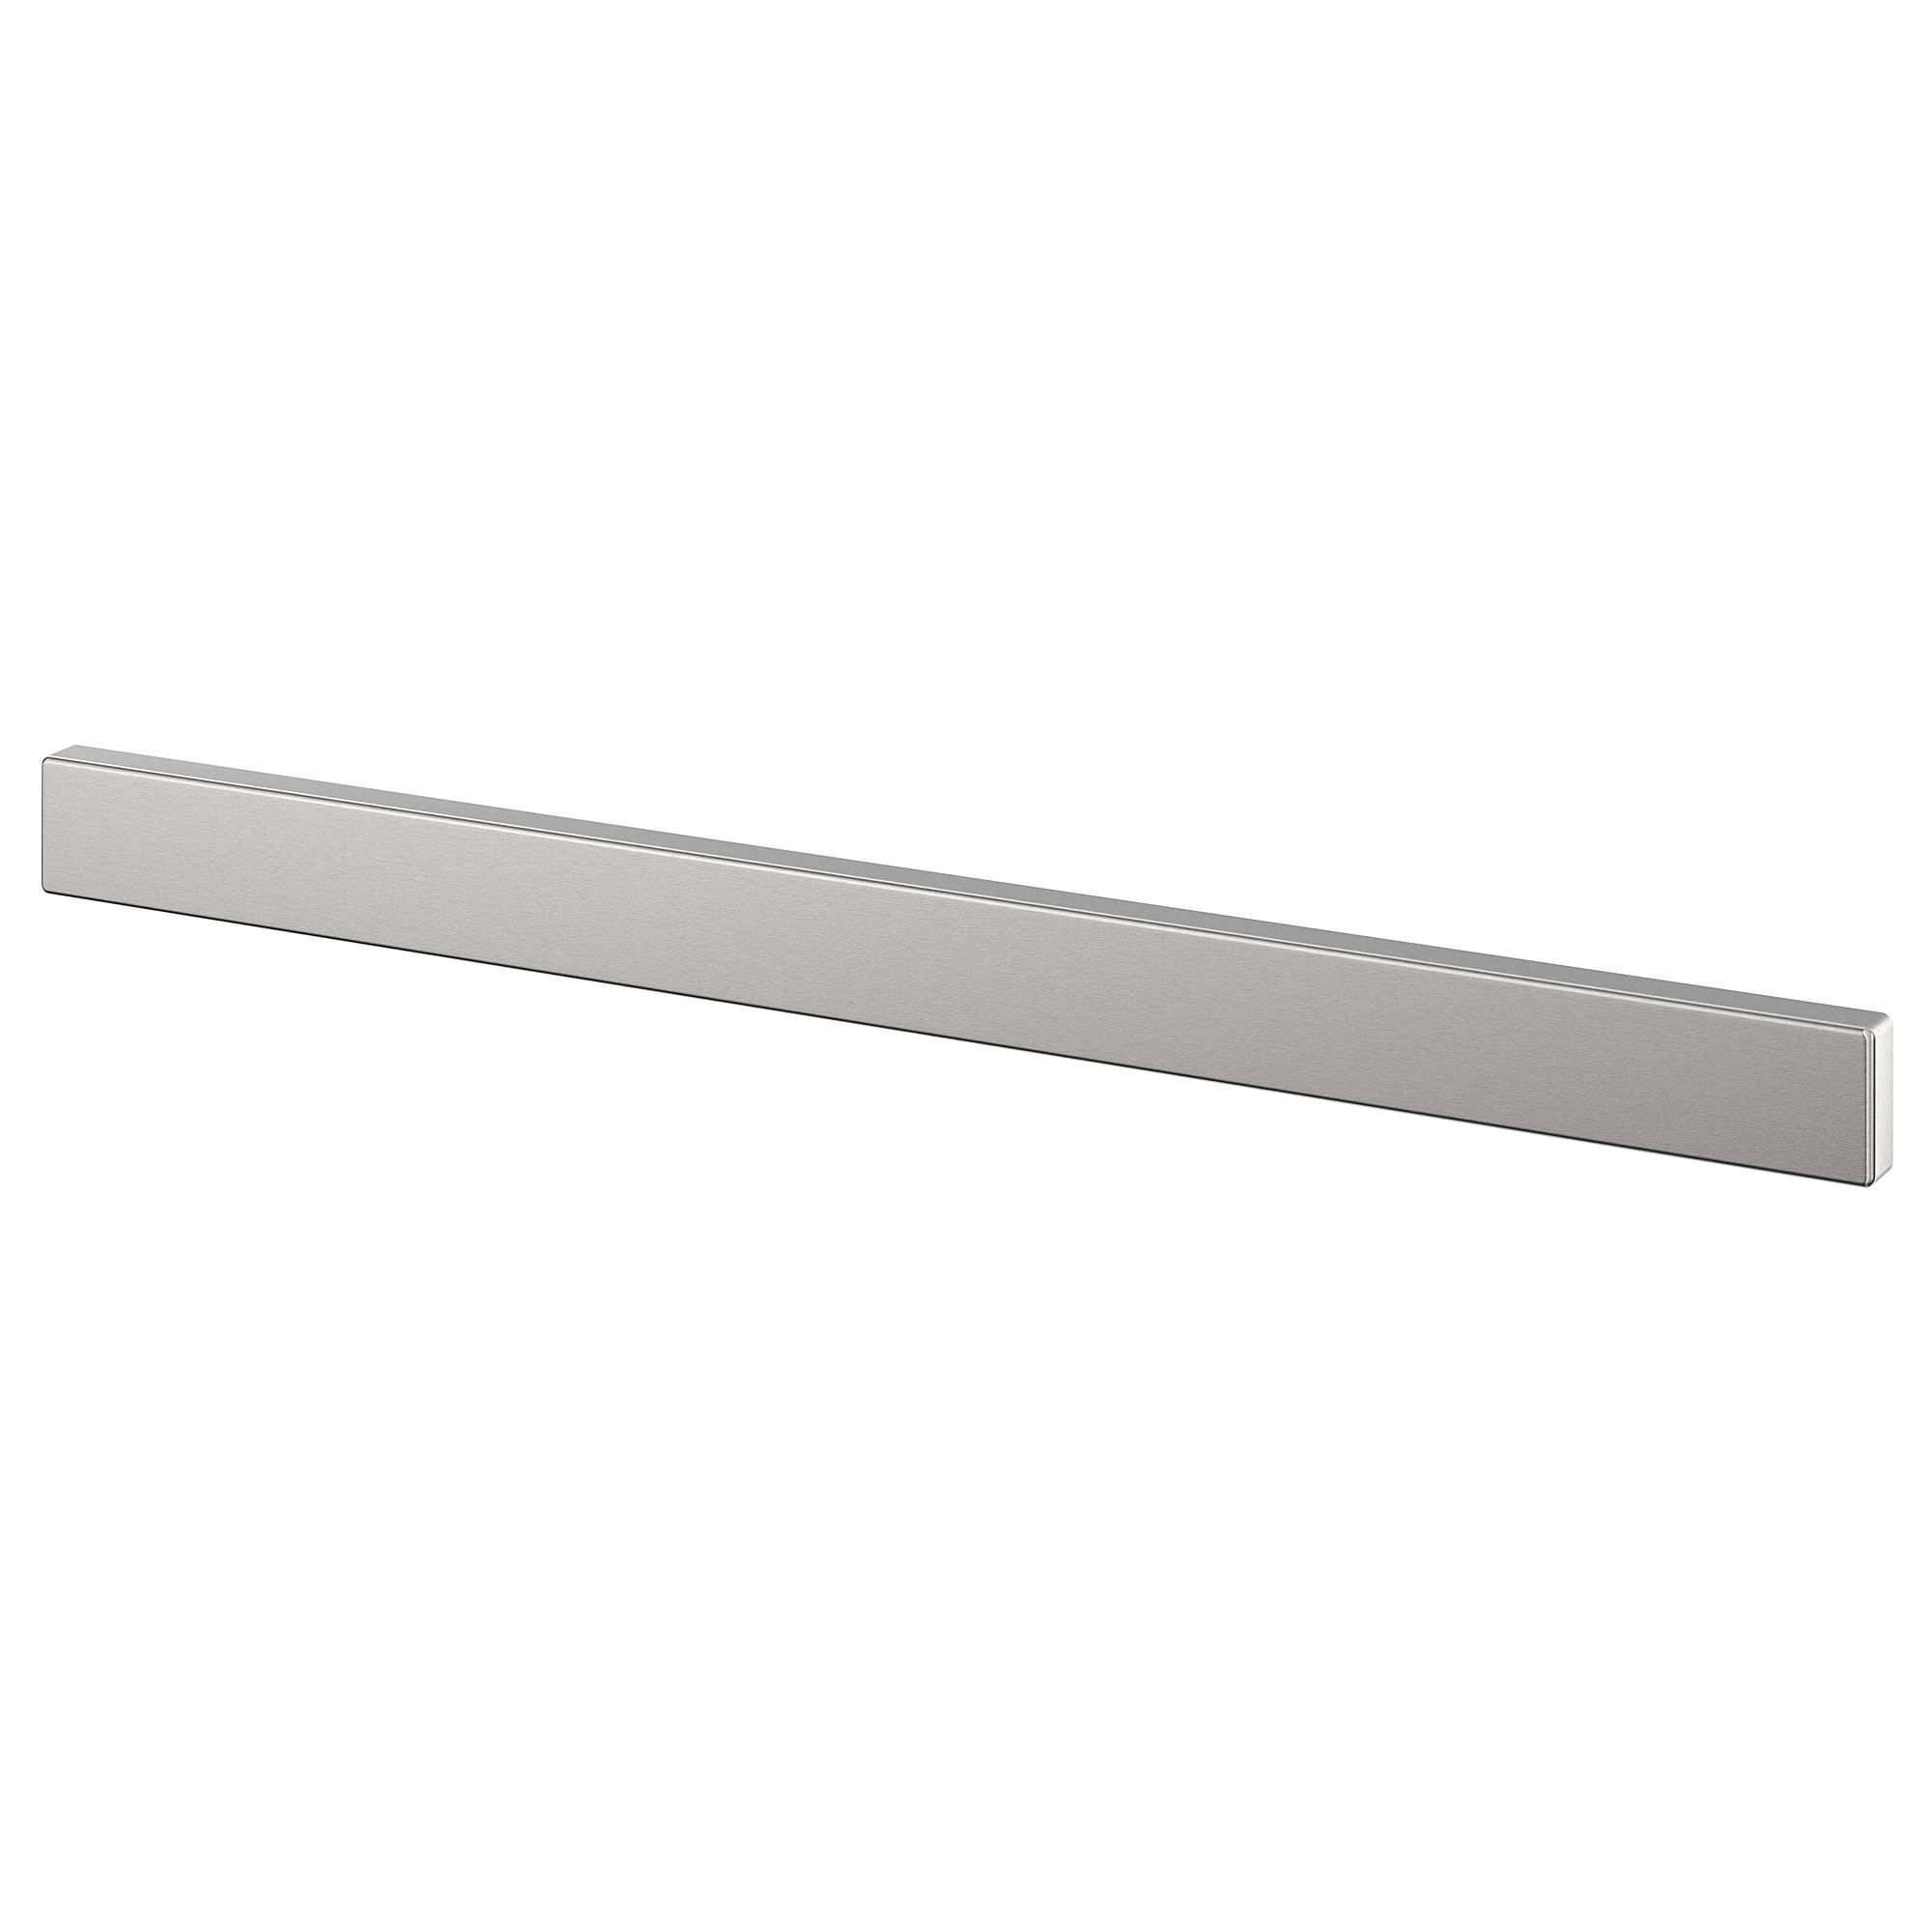 Ikea Stainless Steel Magnetic Knife Rack